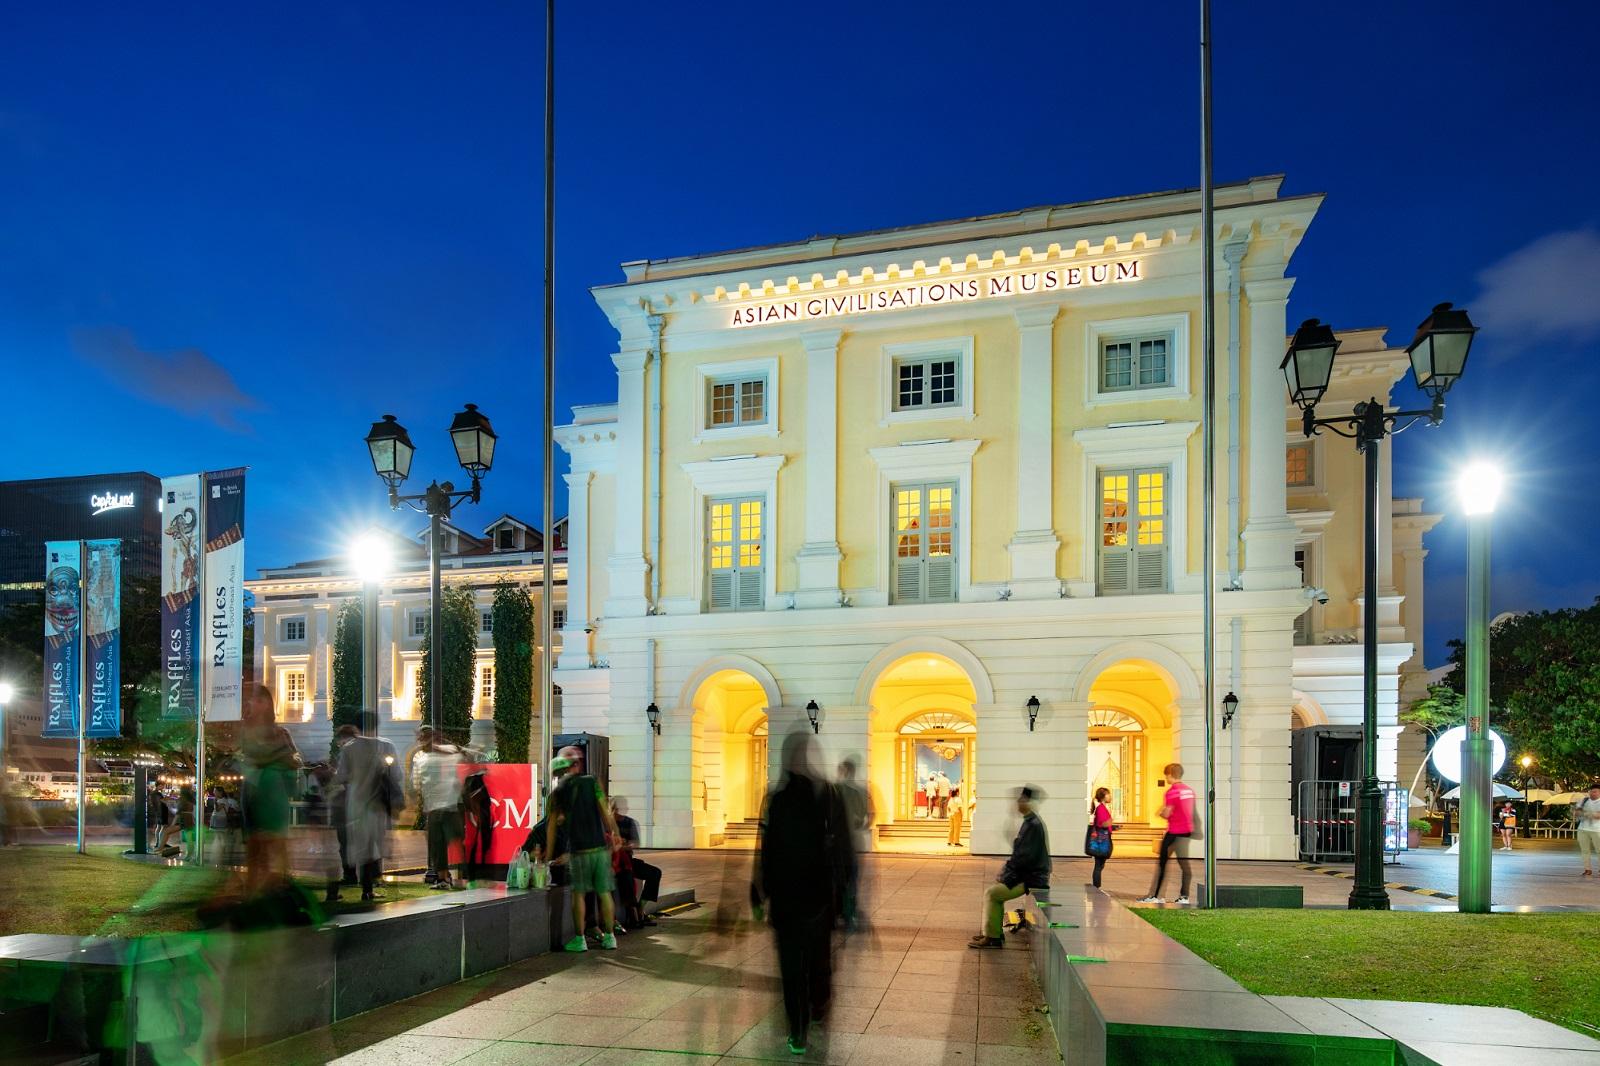 asian civilisations museum facade at night